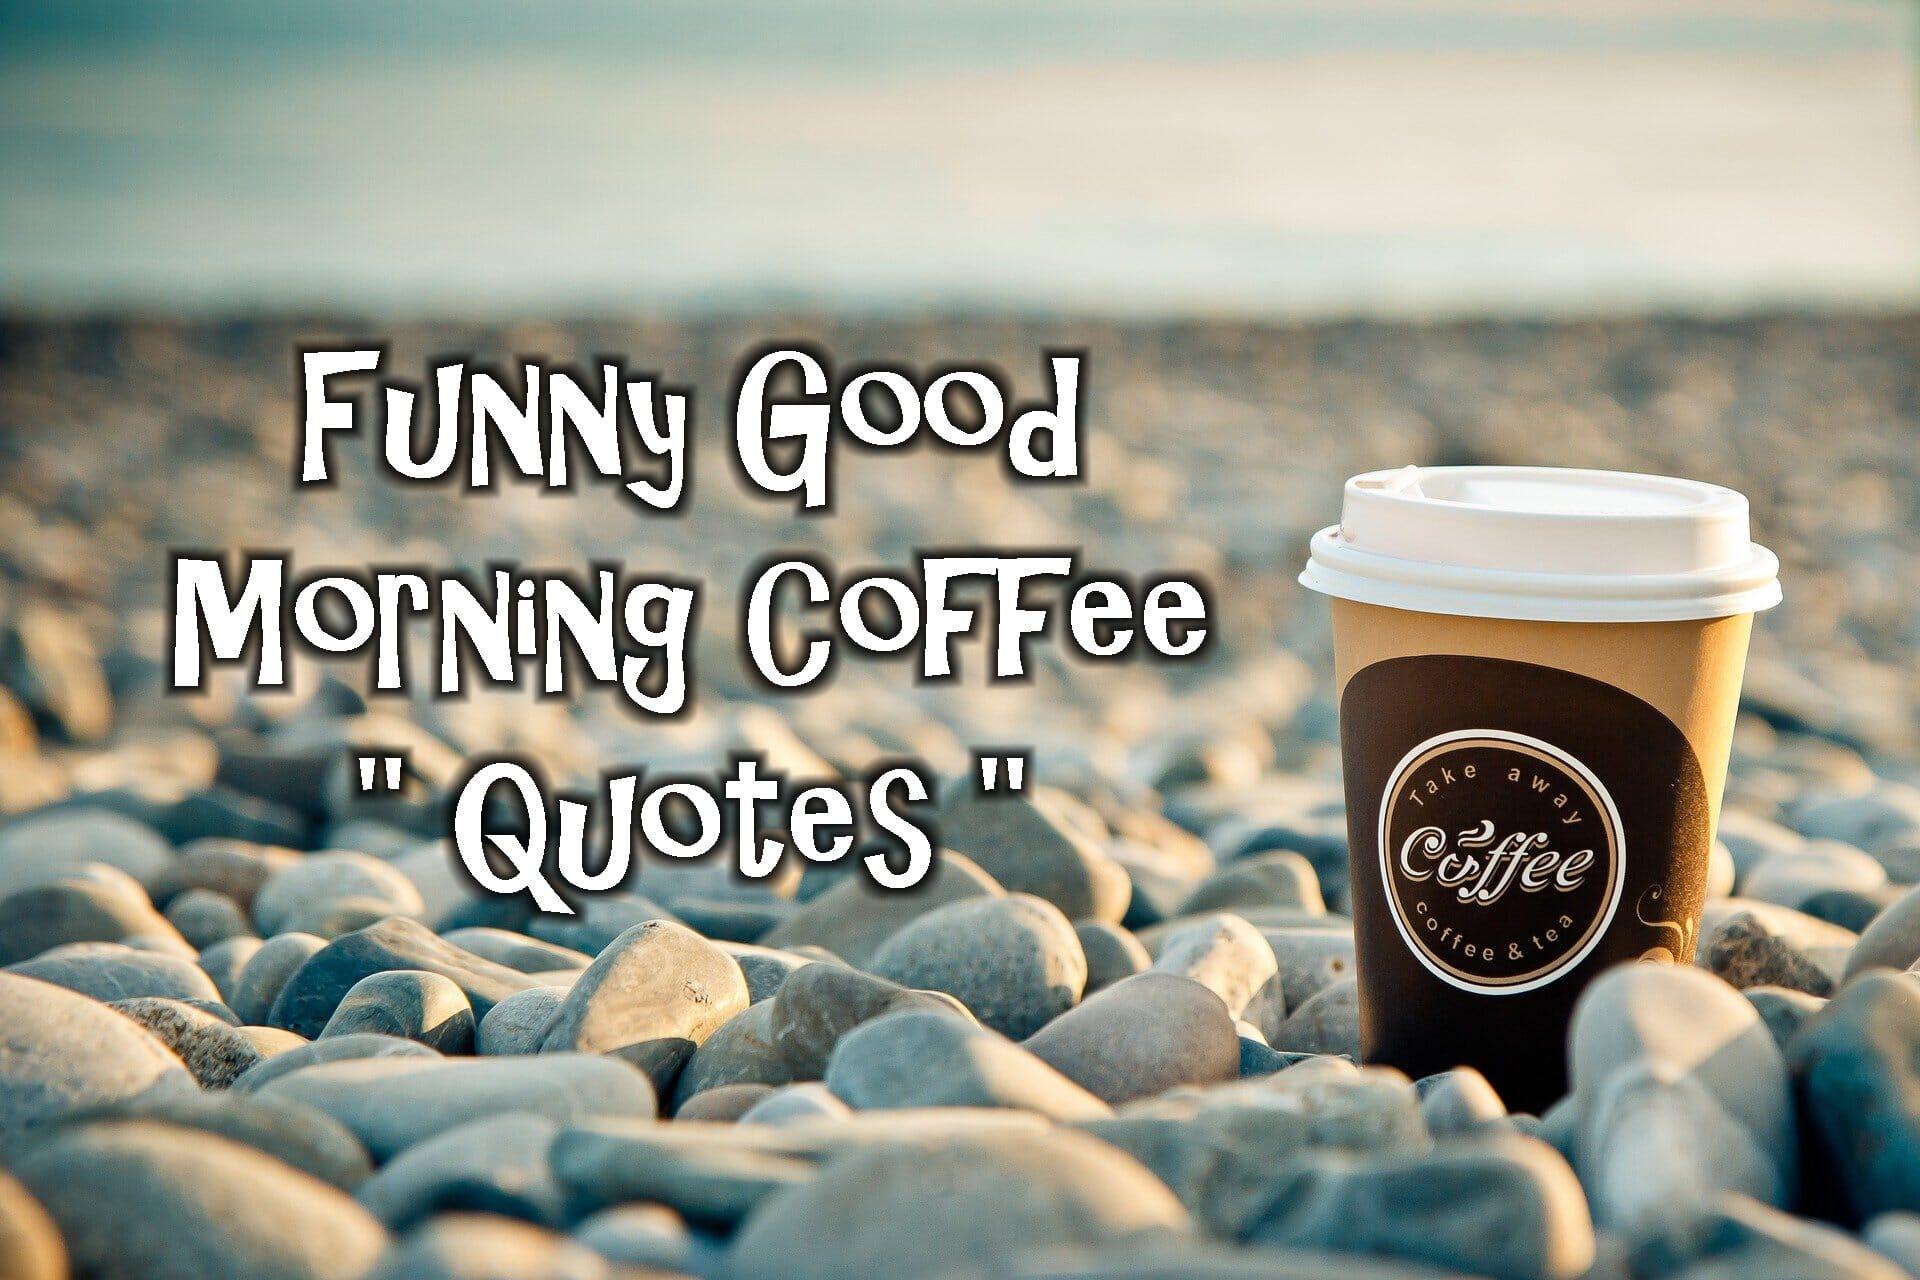 Funny Good Morning Coffee Quotes Coffeenwine